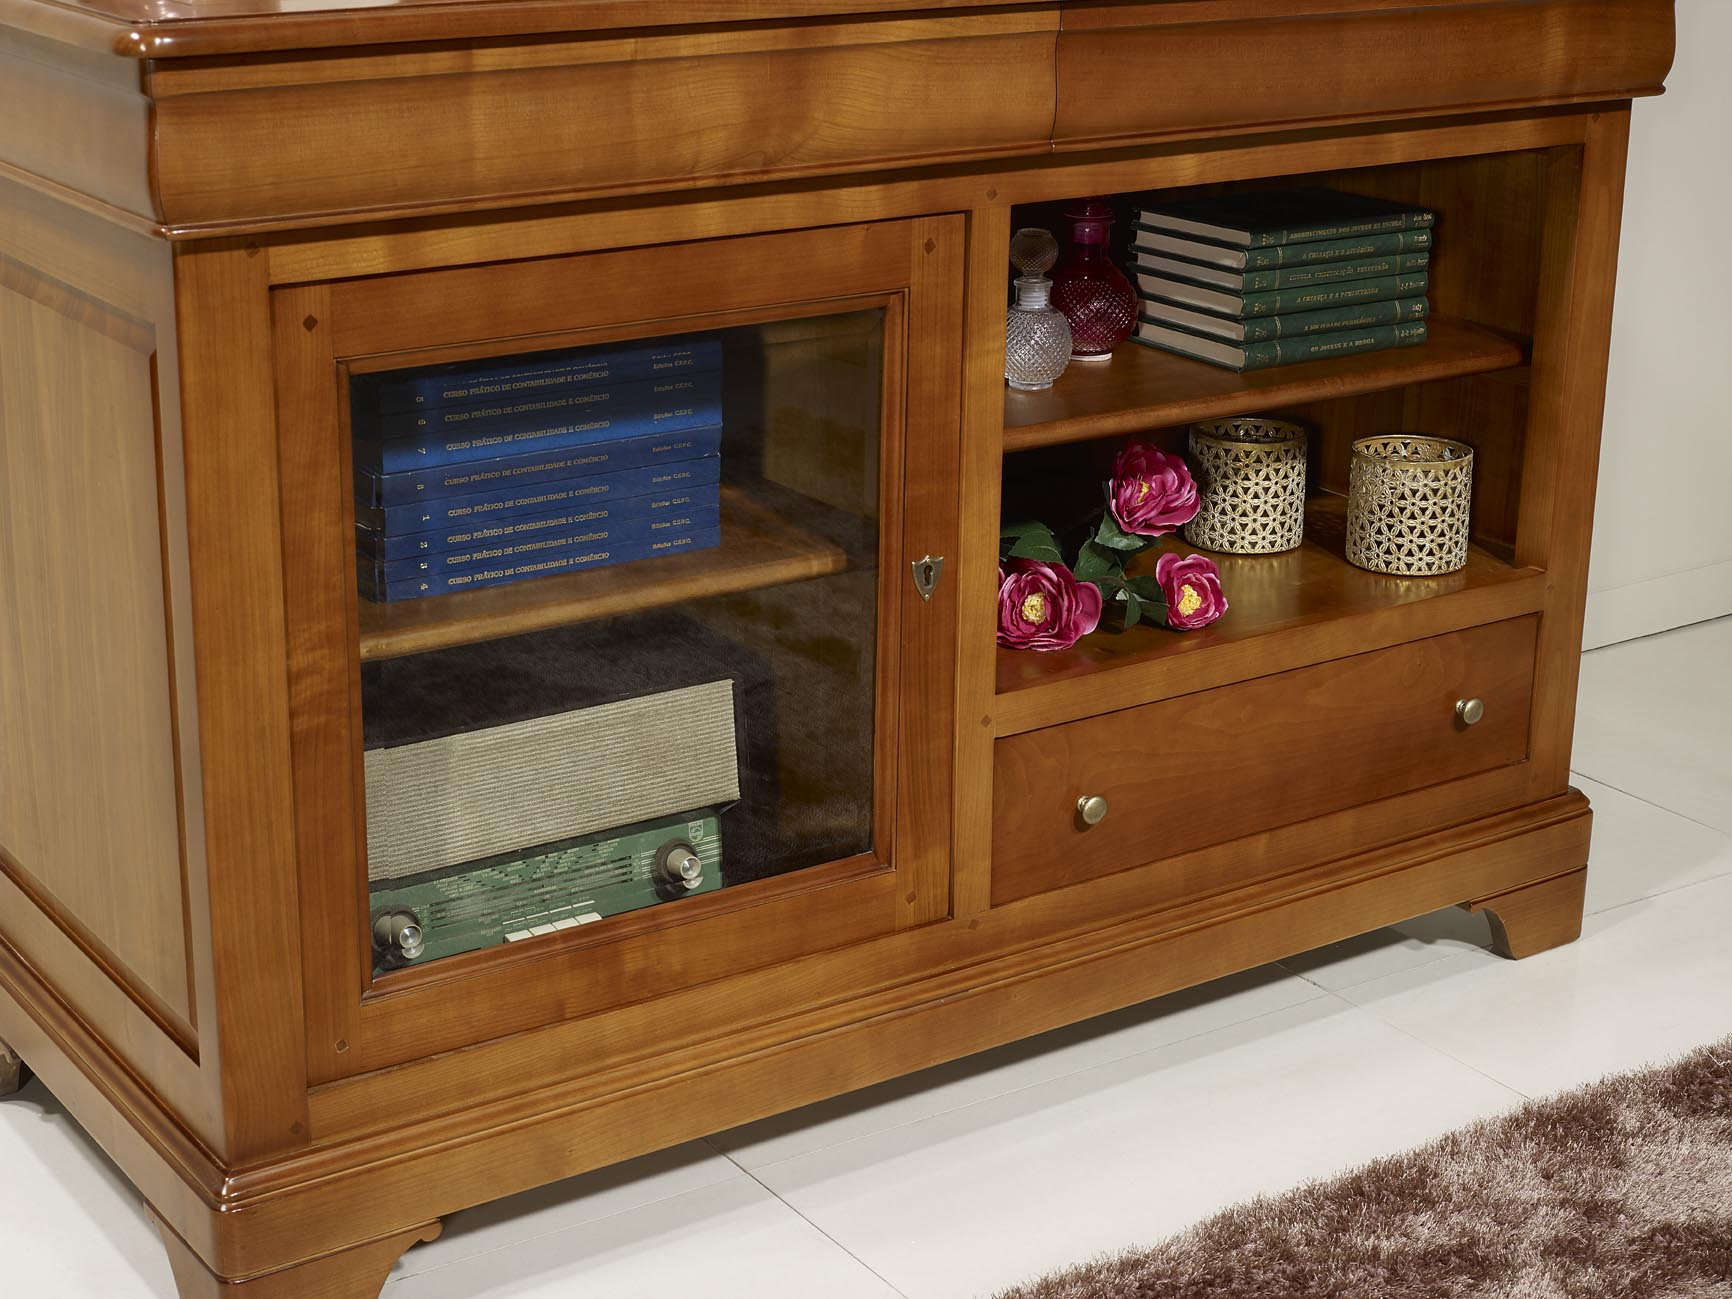 meuble tv 16 9eme marianne en merisier massif de style louis philippe meuble en merisier. Black Bedroom Furniture Sets. Home Design Ideas